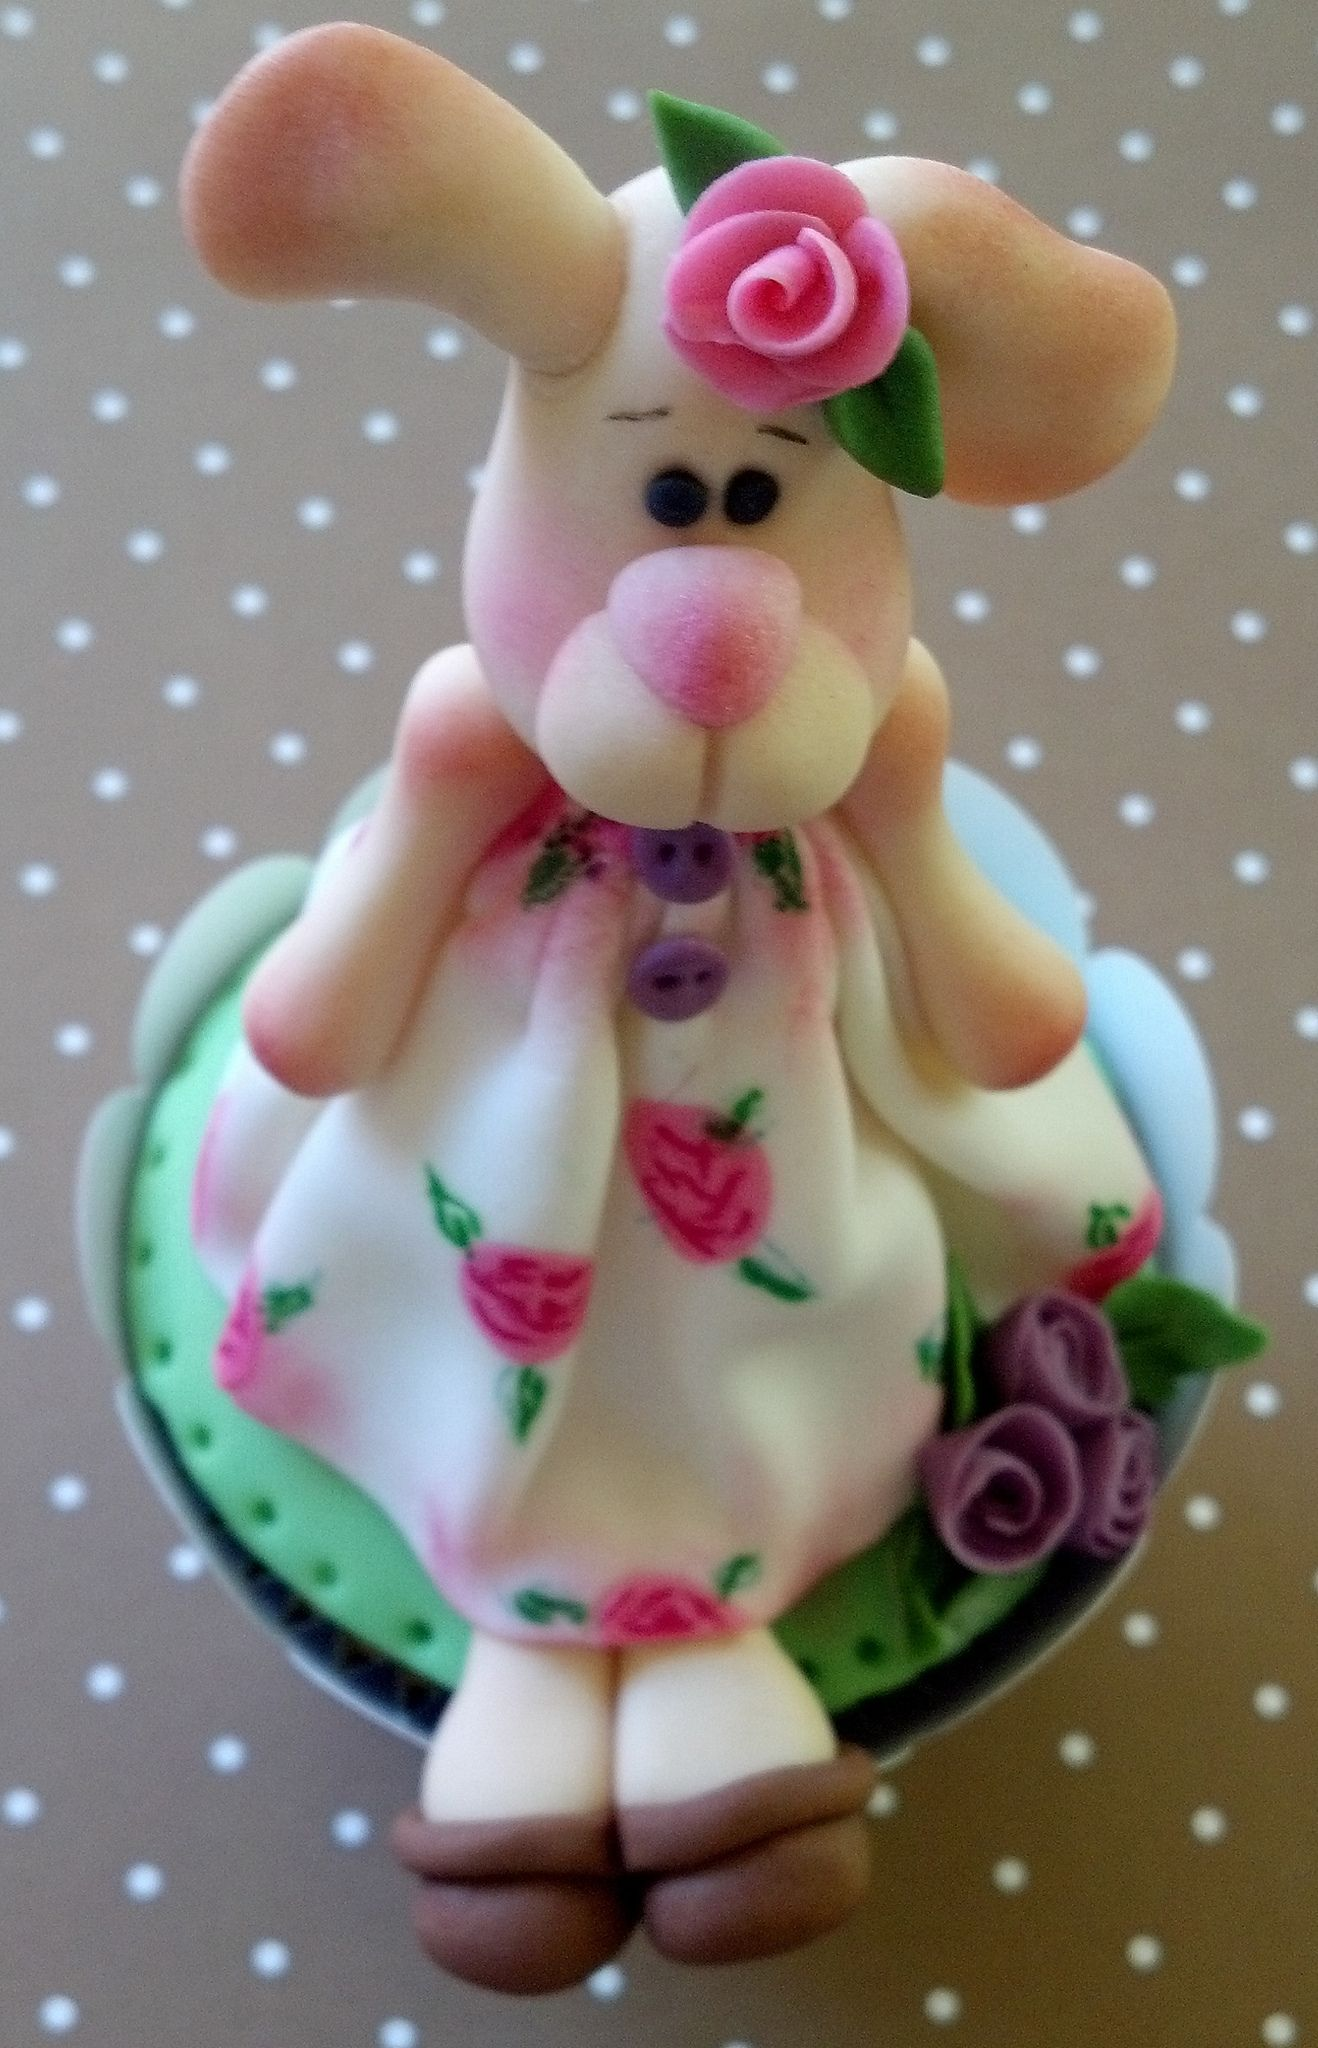 https://flic.kr/p/dWA2ey   2013-02-18_13-49-51_319 (2)   Cupcakes de Páscoa 2013Cupcake Easter 2013